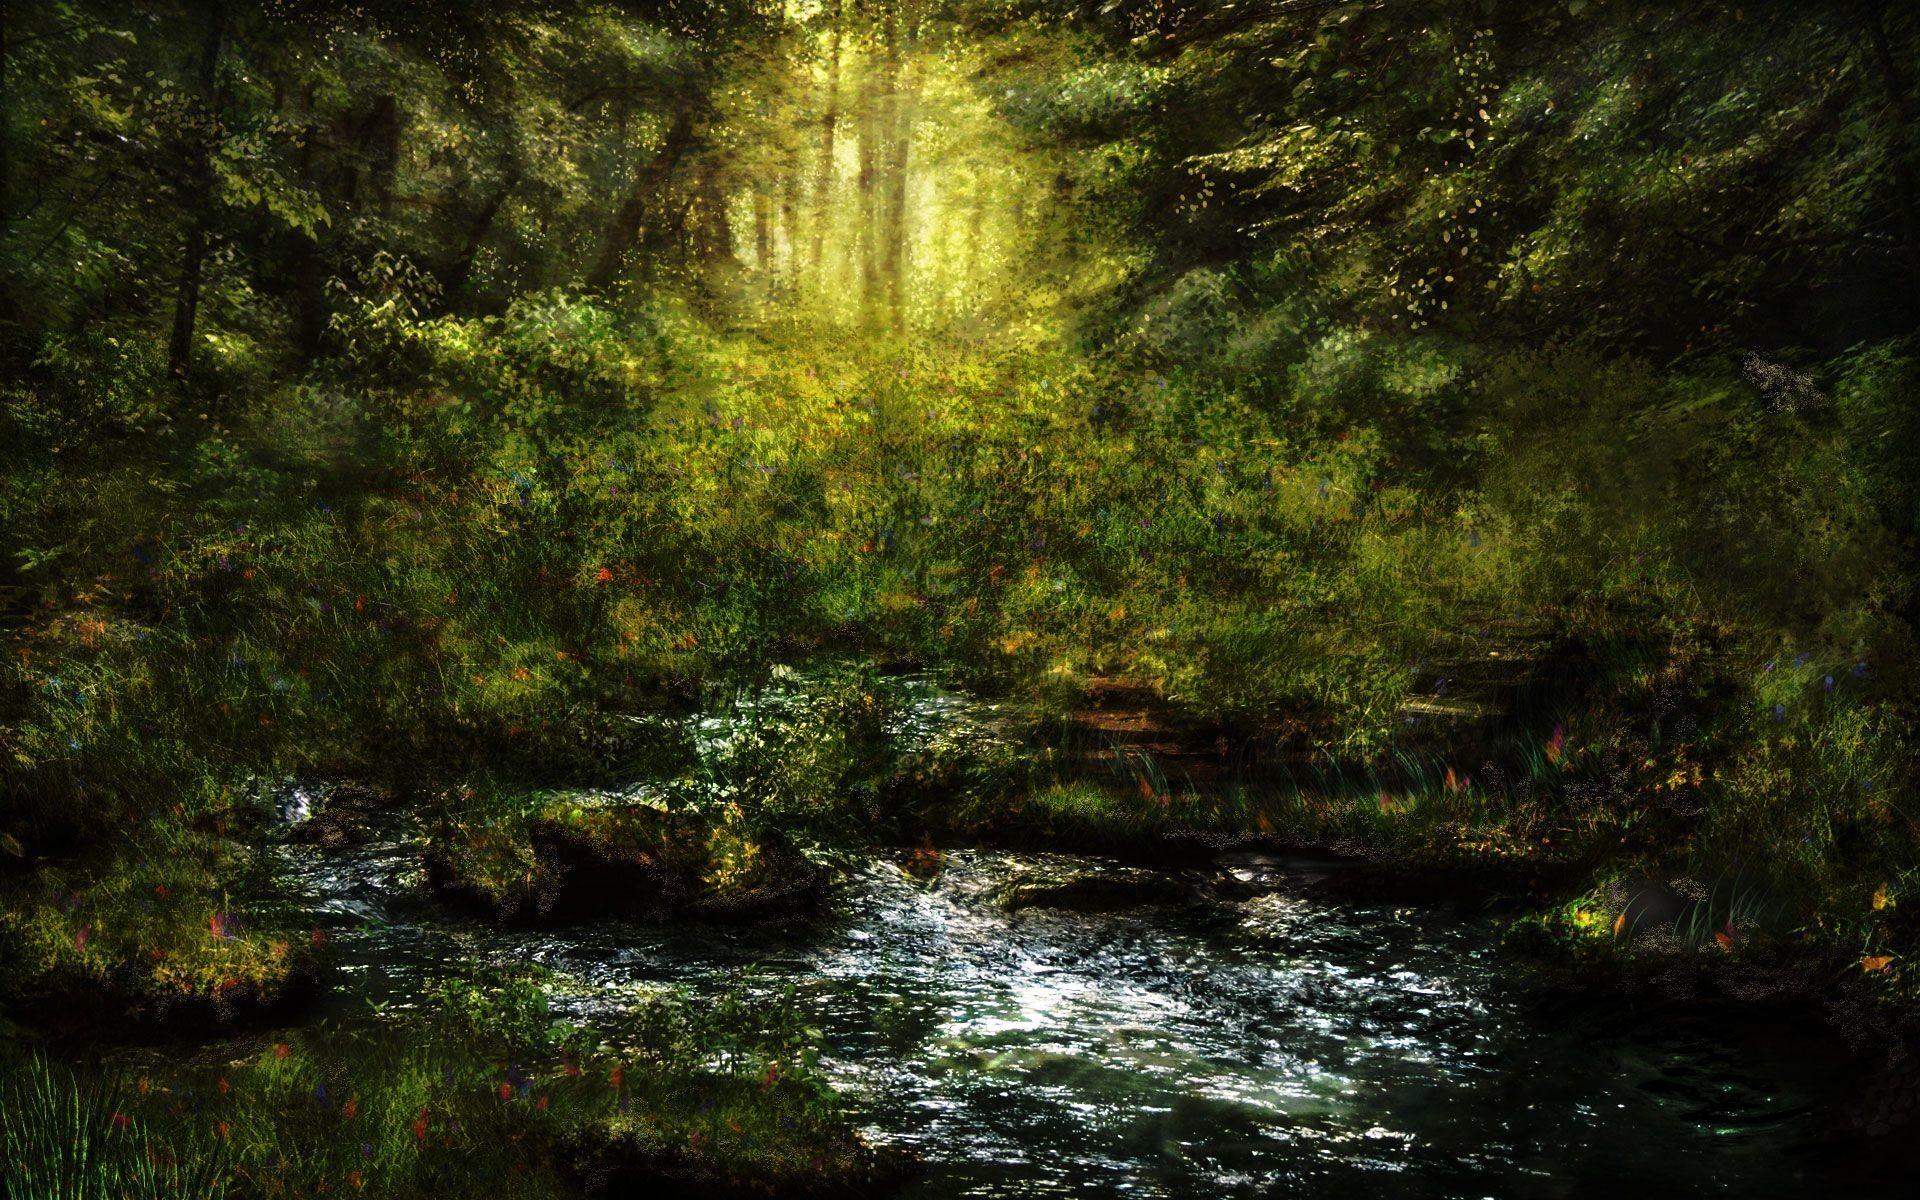 Fantasy Forest wallpaper 158541